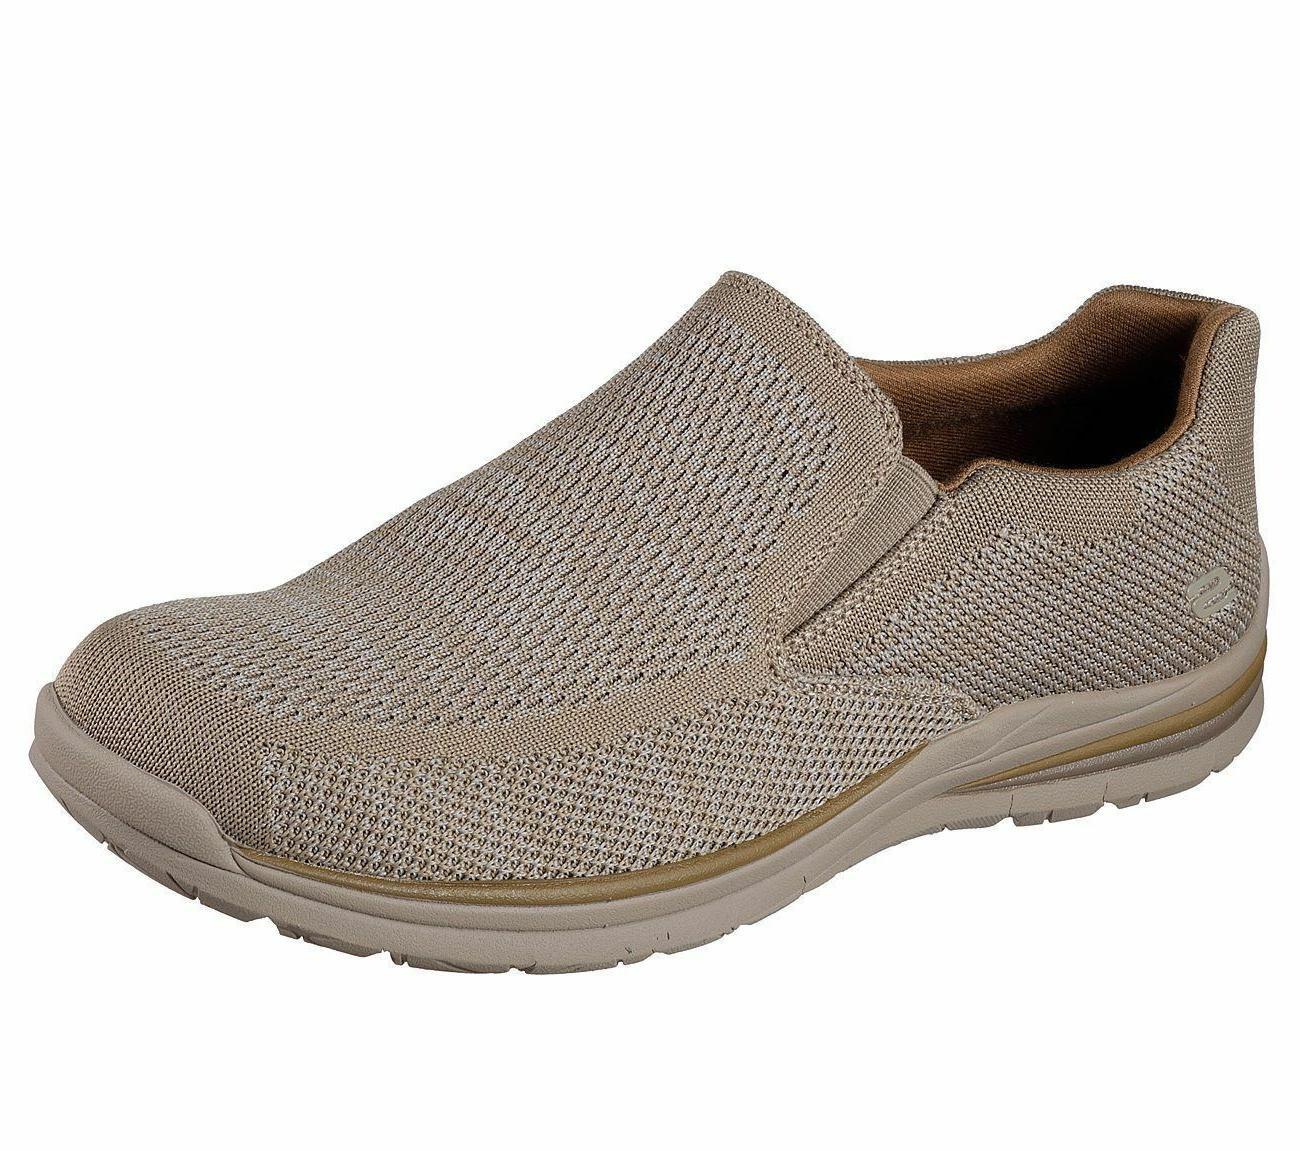 65199 taupe shoes men memory foam dress